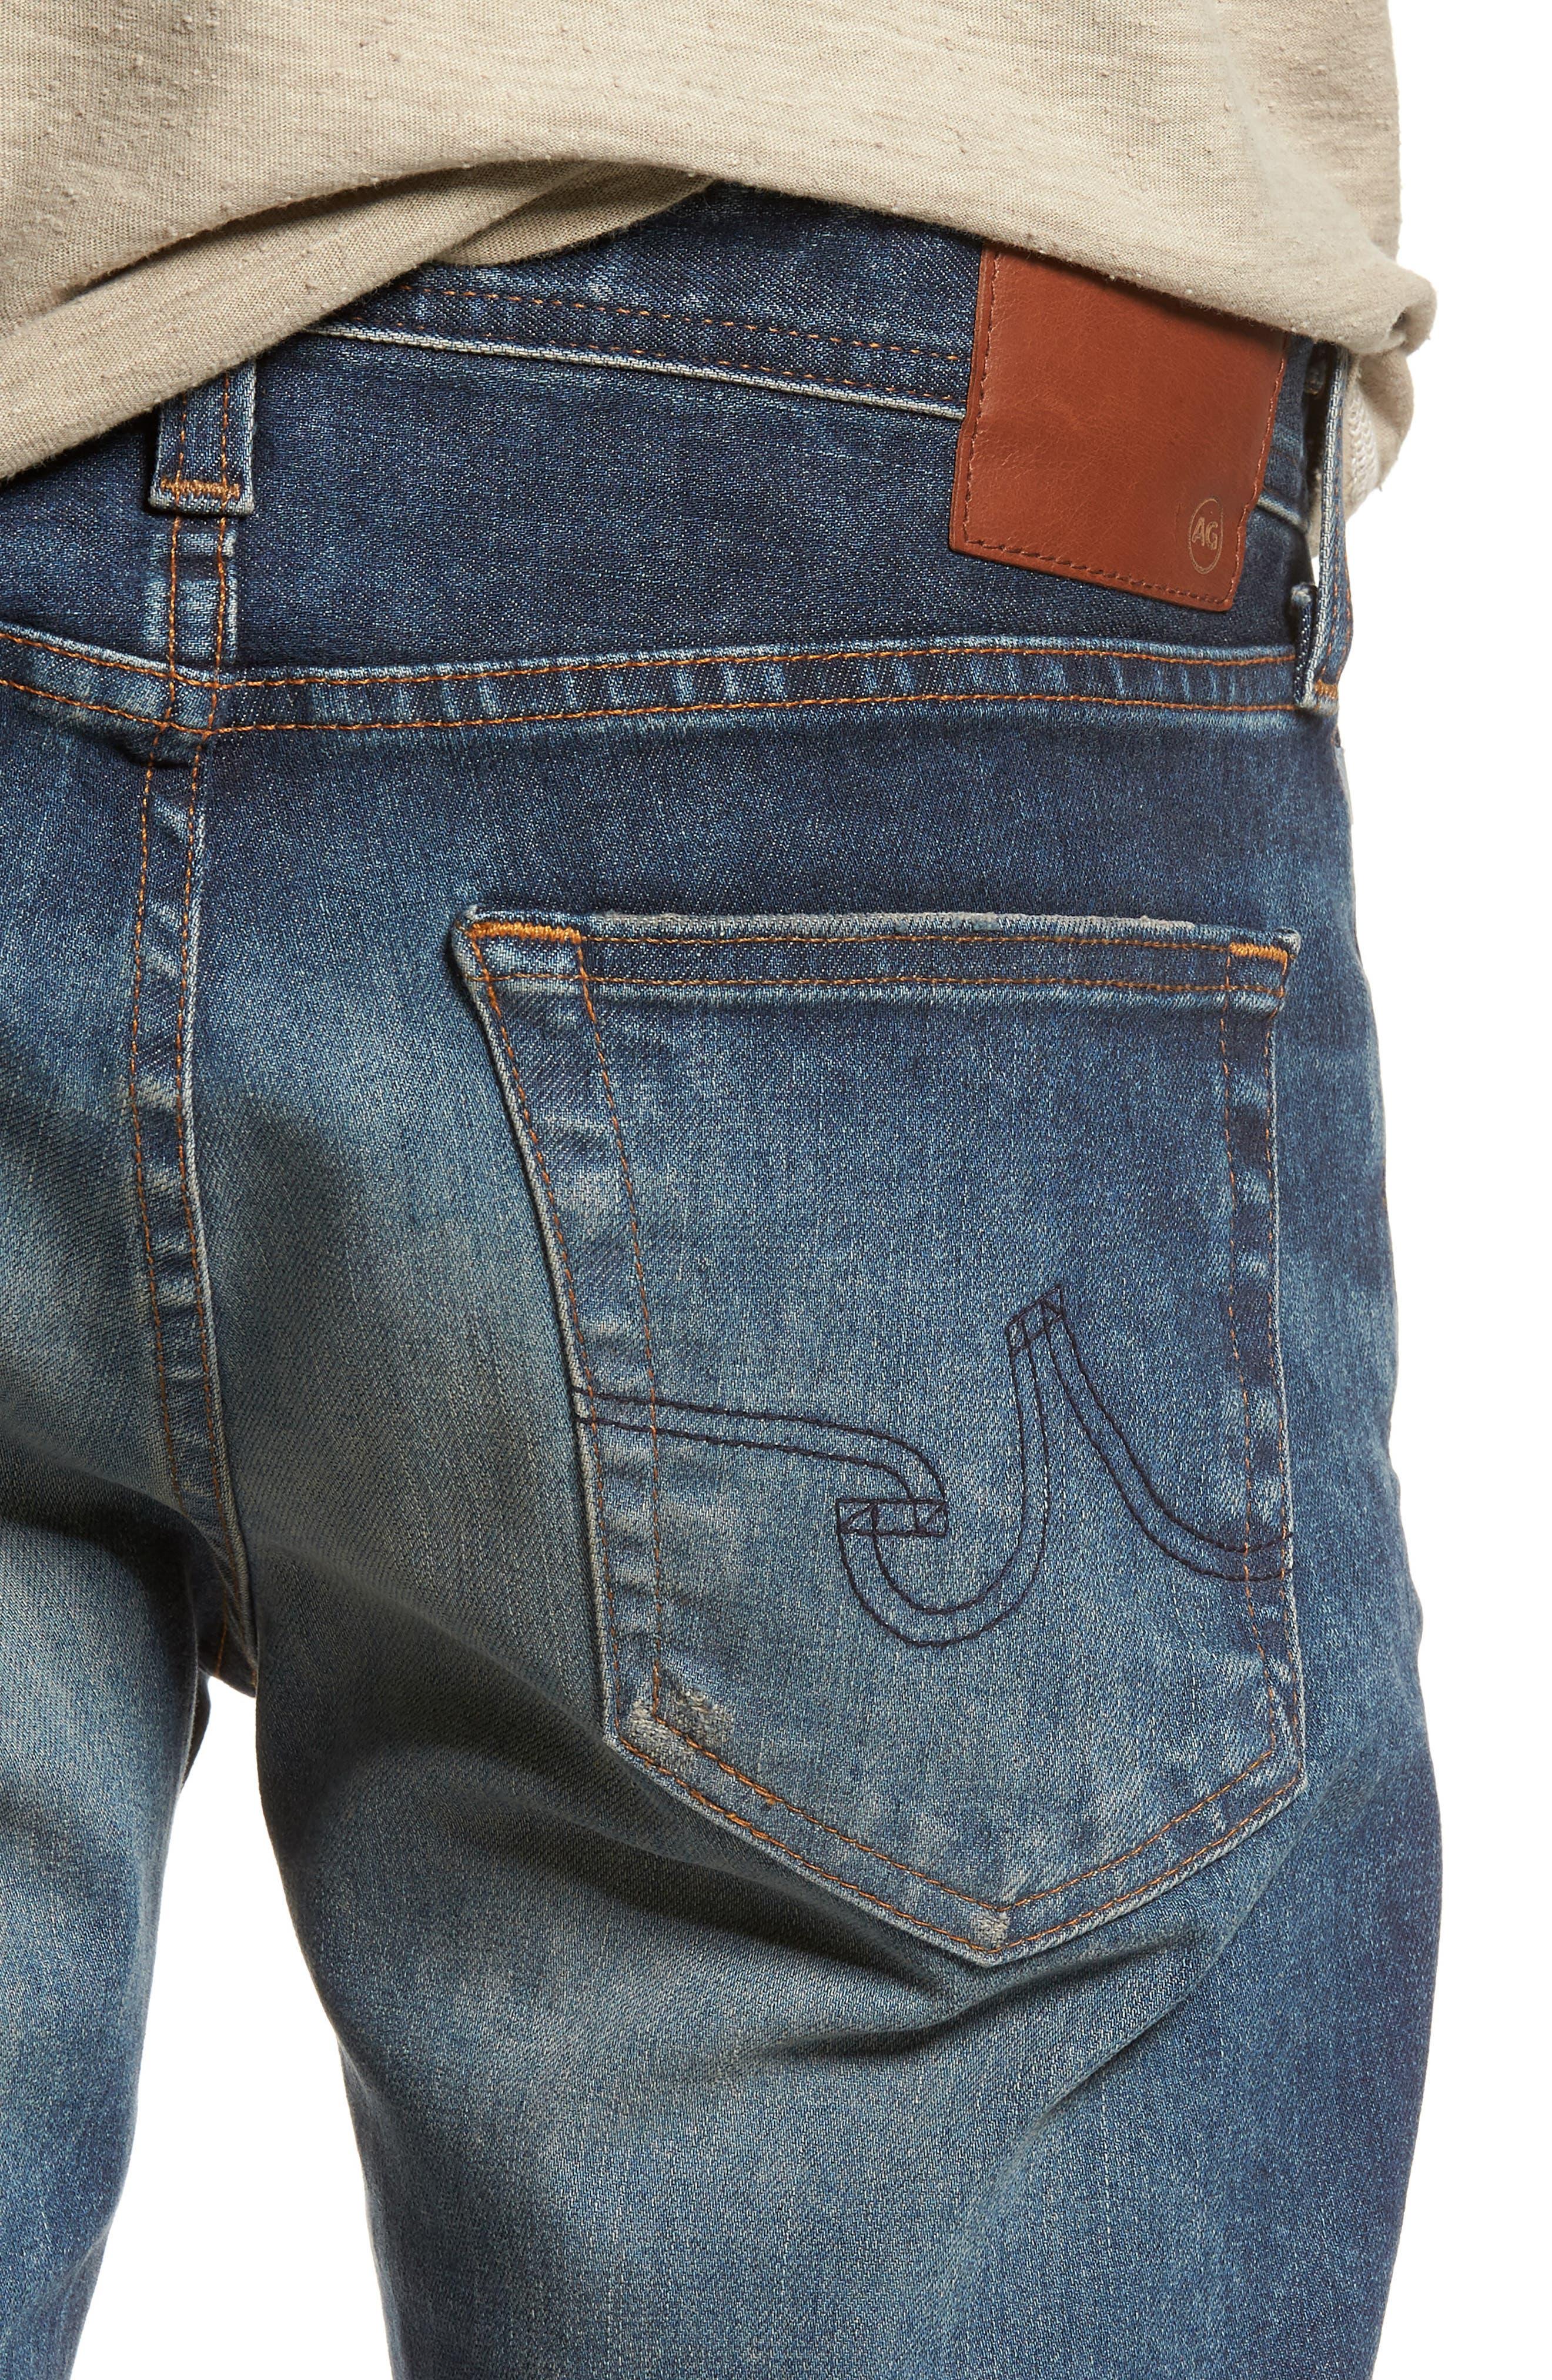 Dylan Slim Skinny Fit Jeans,                             Alternate thumbnail 4, color,                             12 Years River Veil